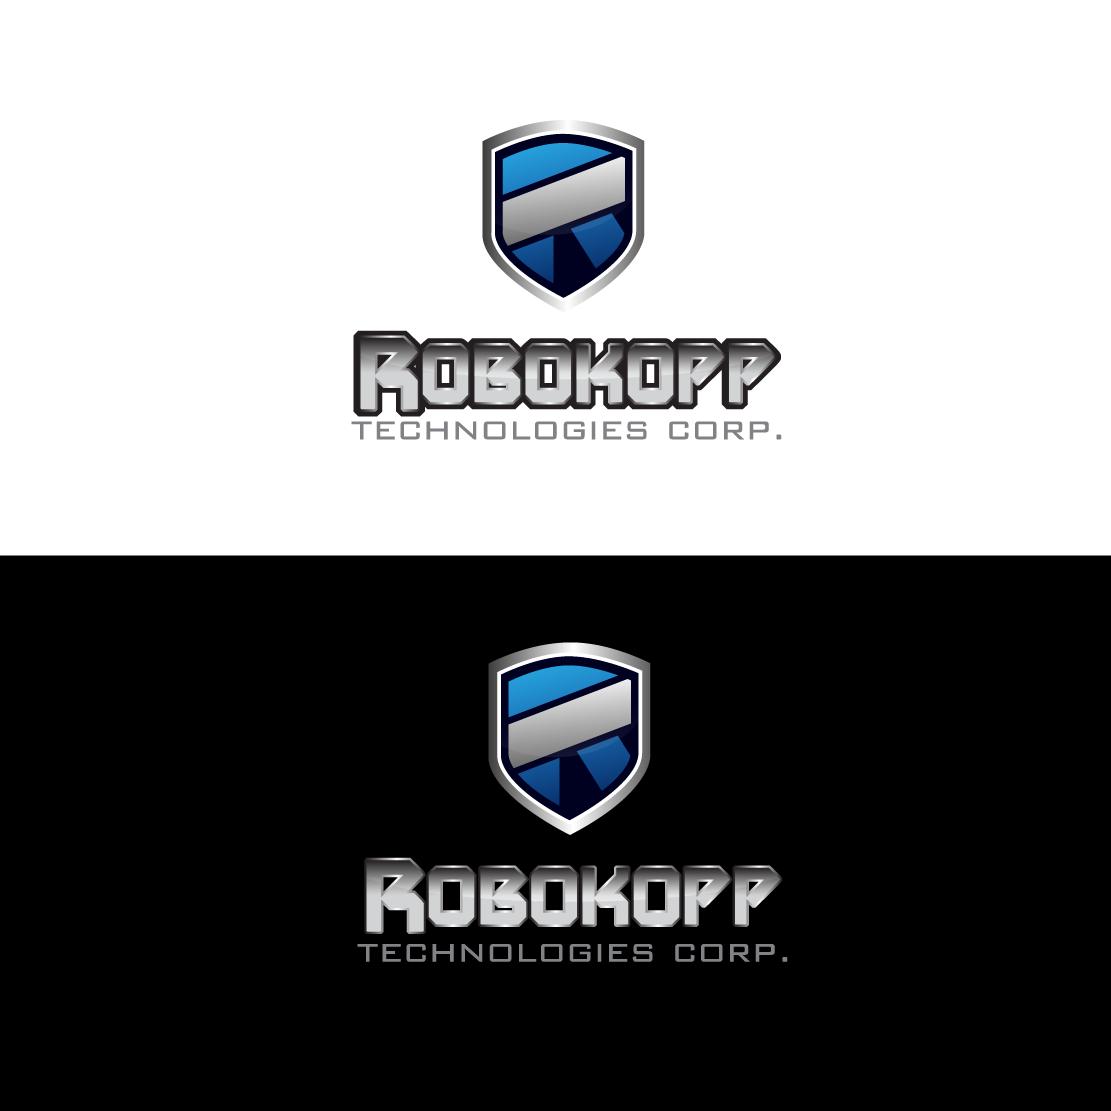 Logo Design by Private User - Entry No. 143 in the Logo Design Contest New Logo Design for Robokopp Technologies Corp..